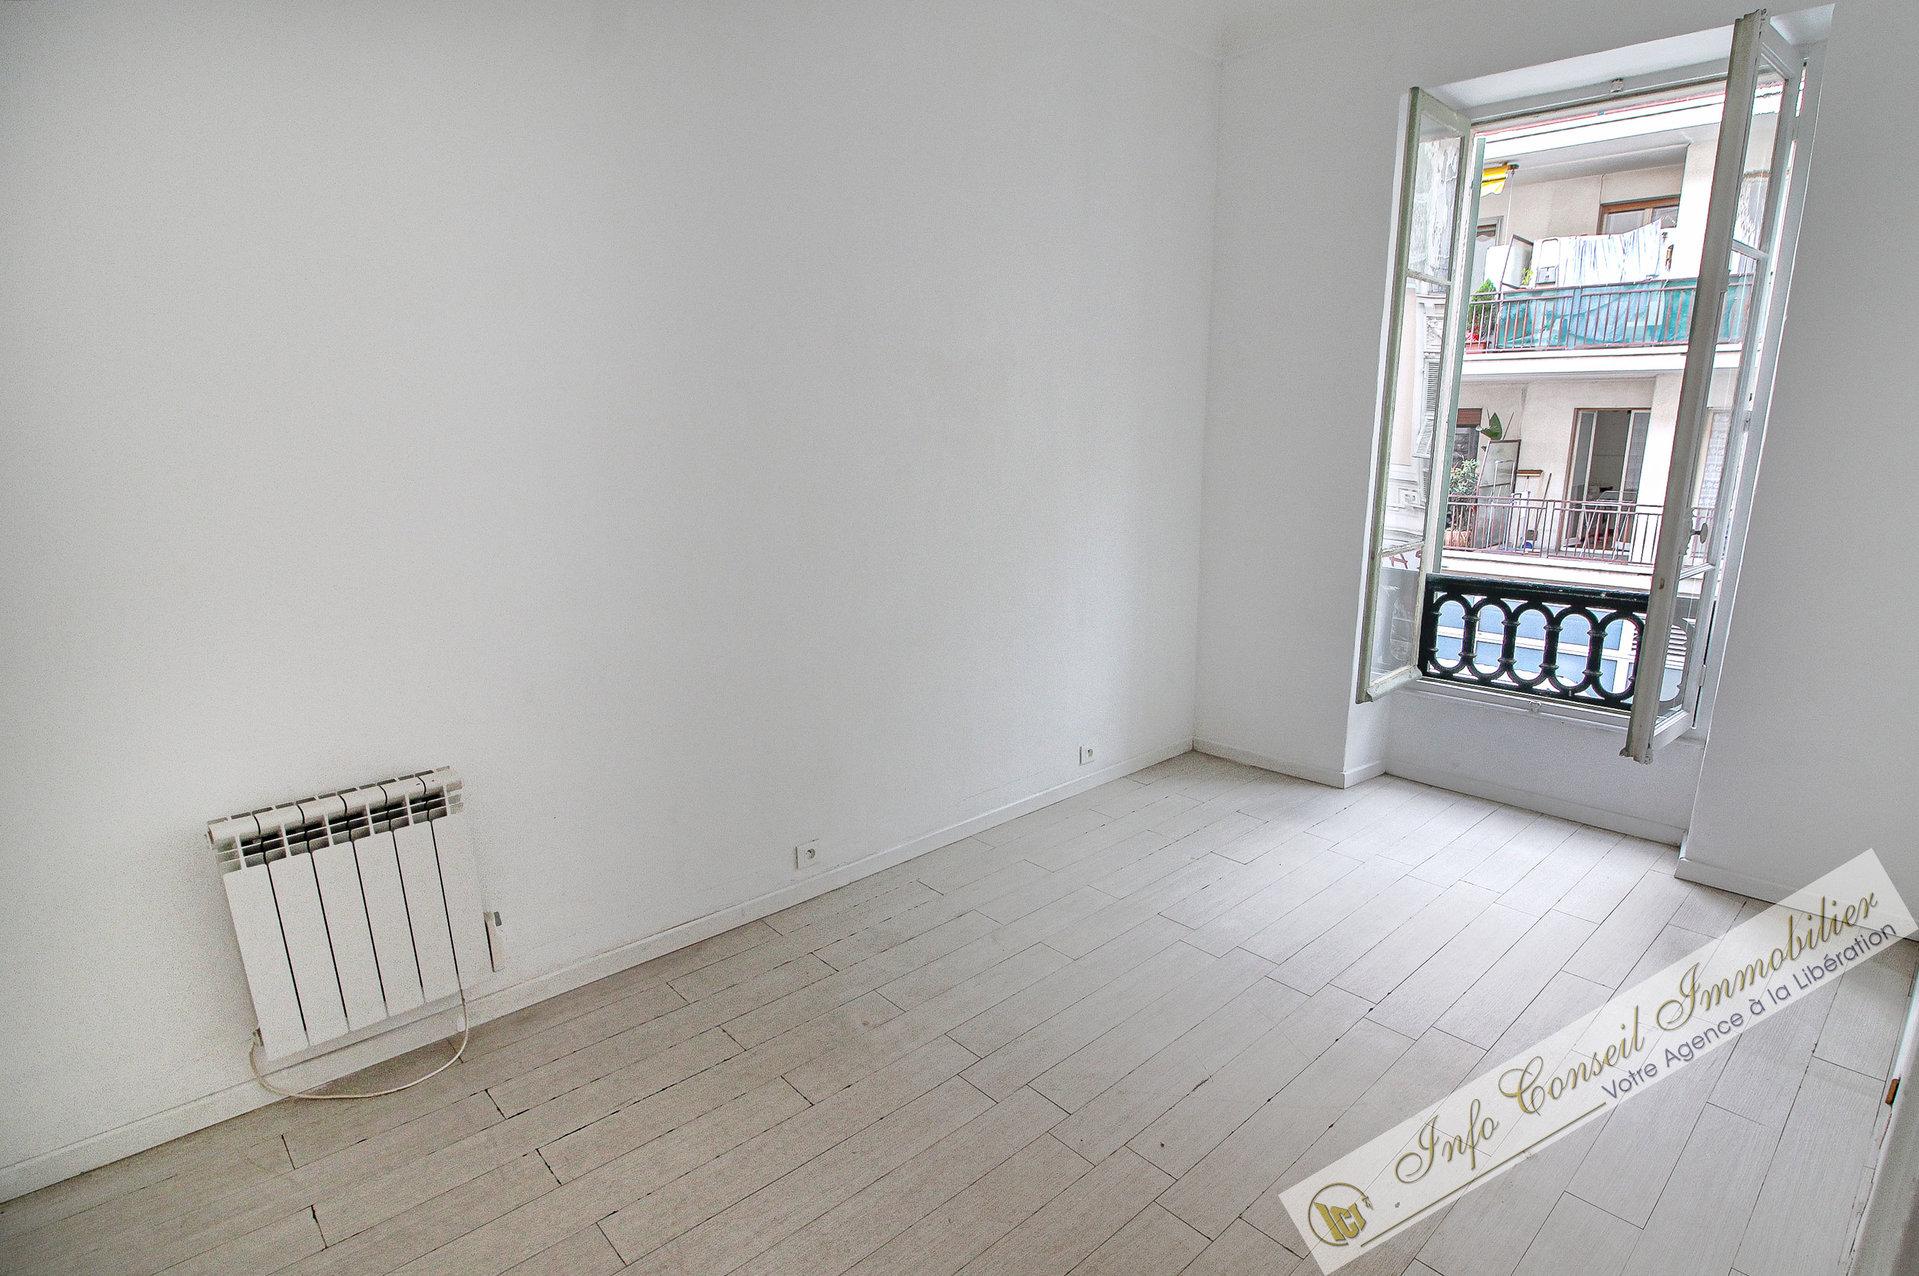 GAMBETTA - ROASSAL - 2P 33 m² - Idéal Locatif - 115.000 €